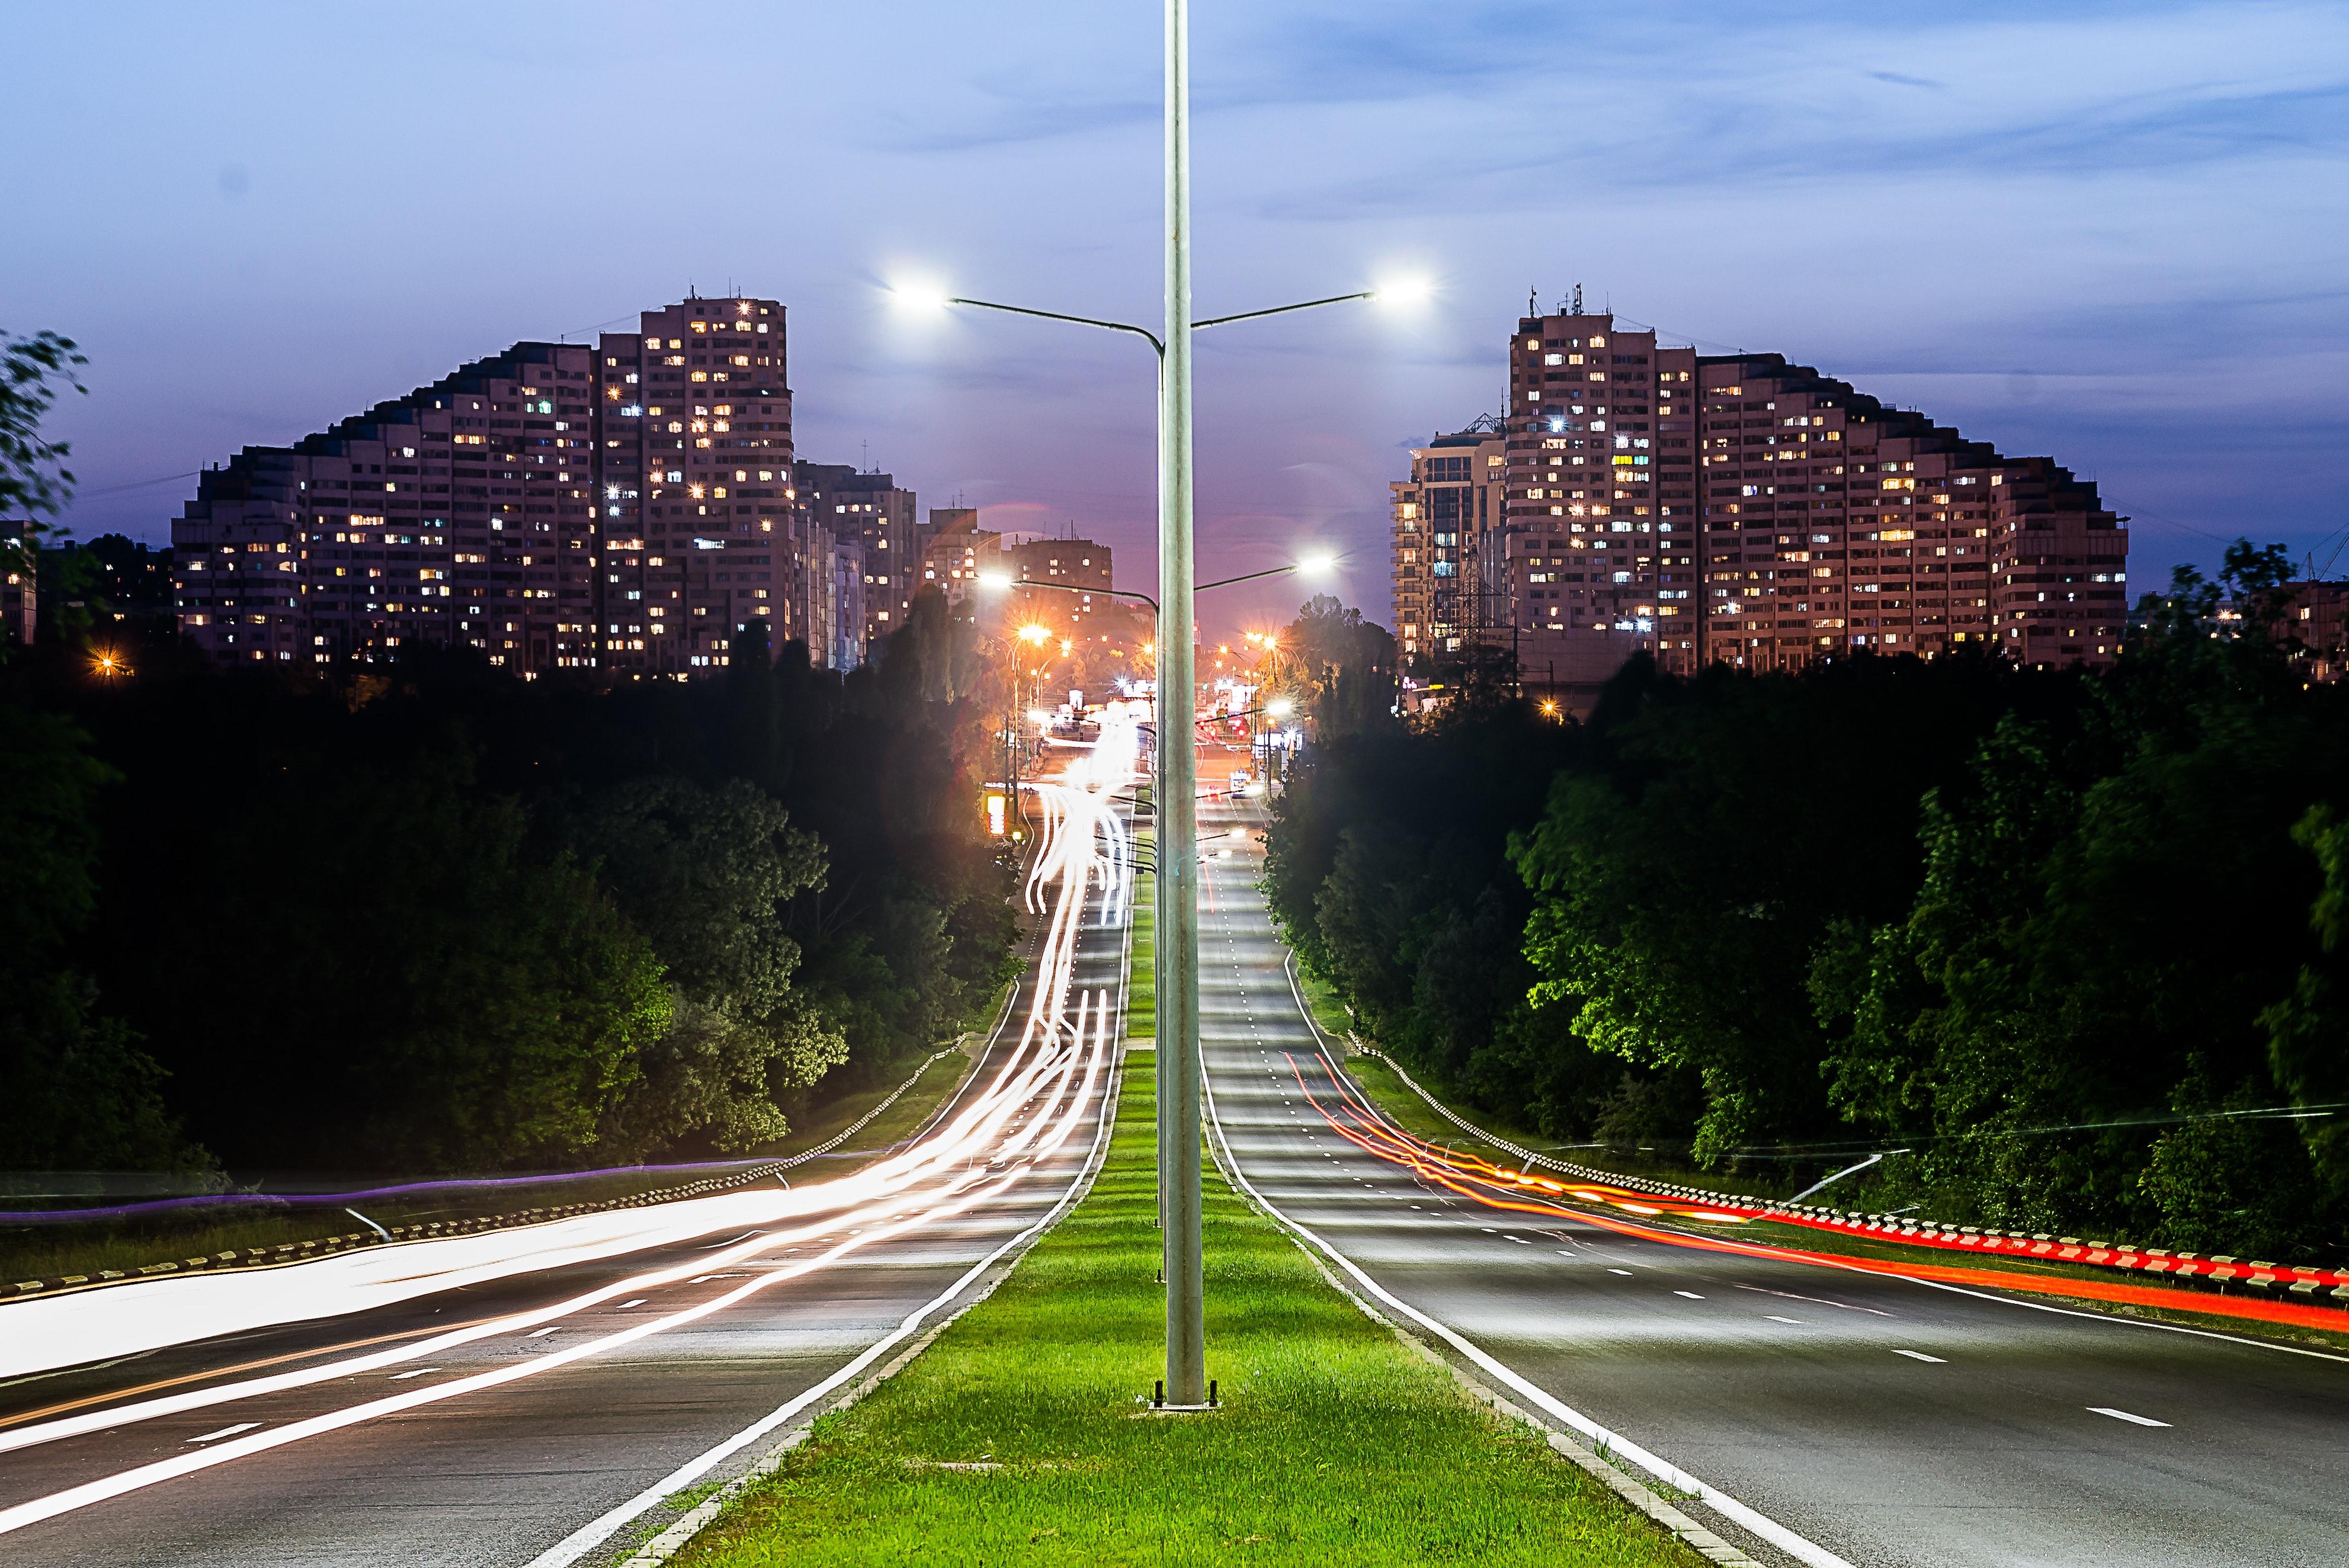 Grey Lamp Port Between Grey Concrete Road, Asphalt, Buildings, City, Highway, HQ Photo